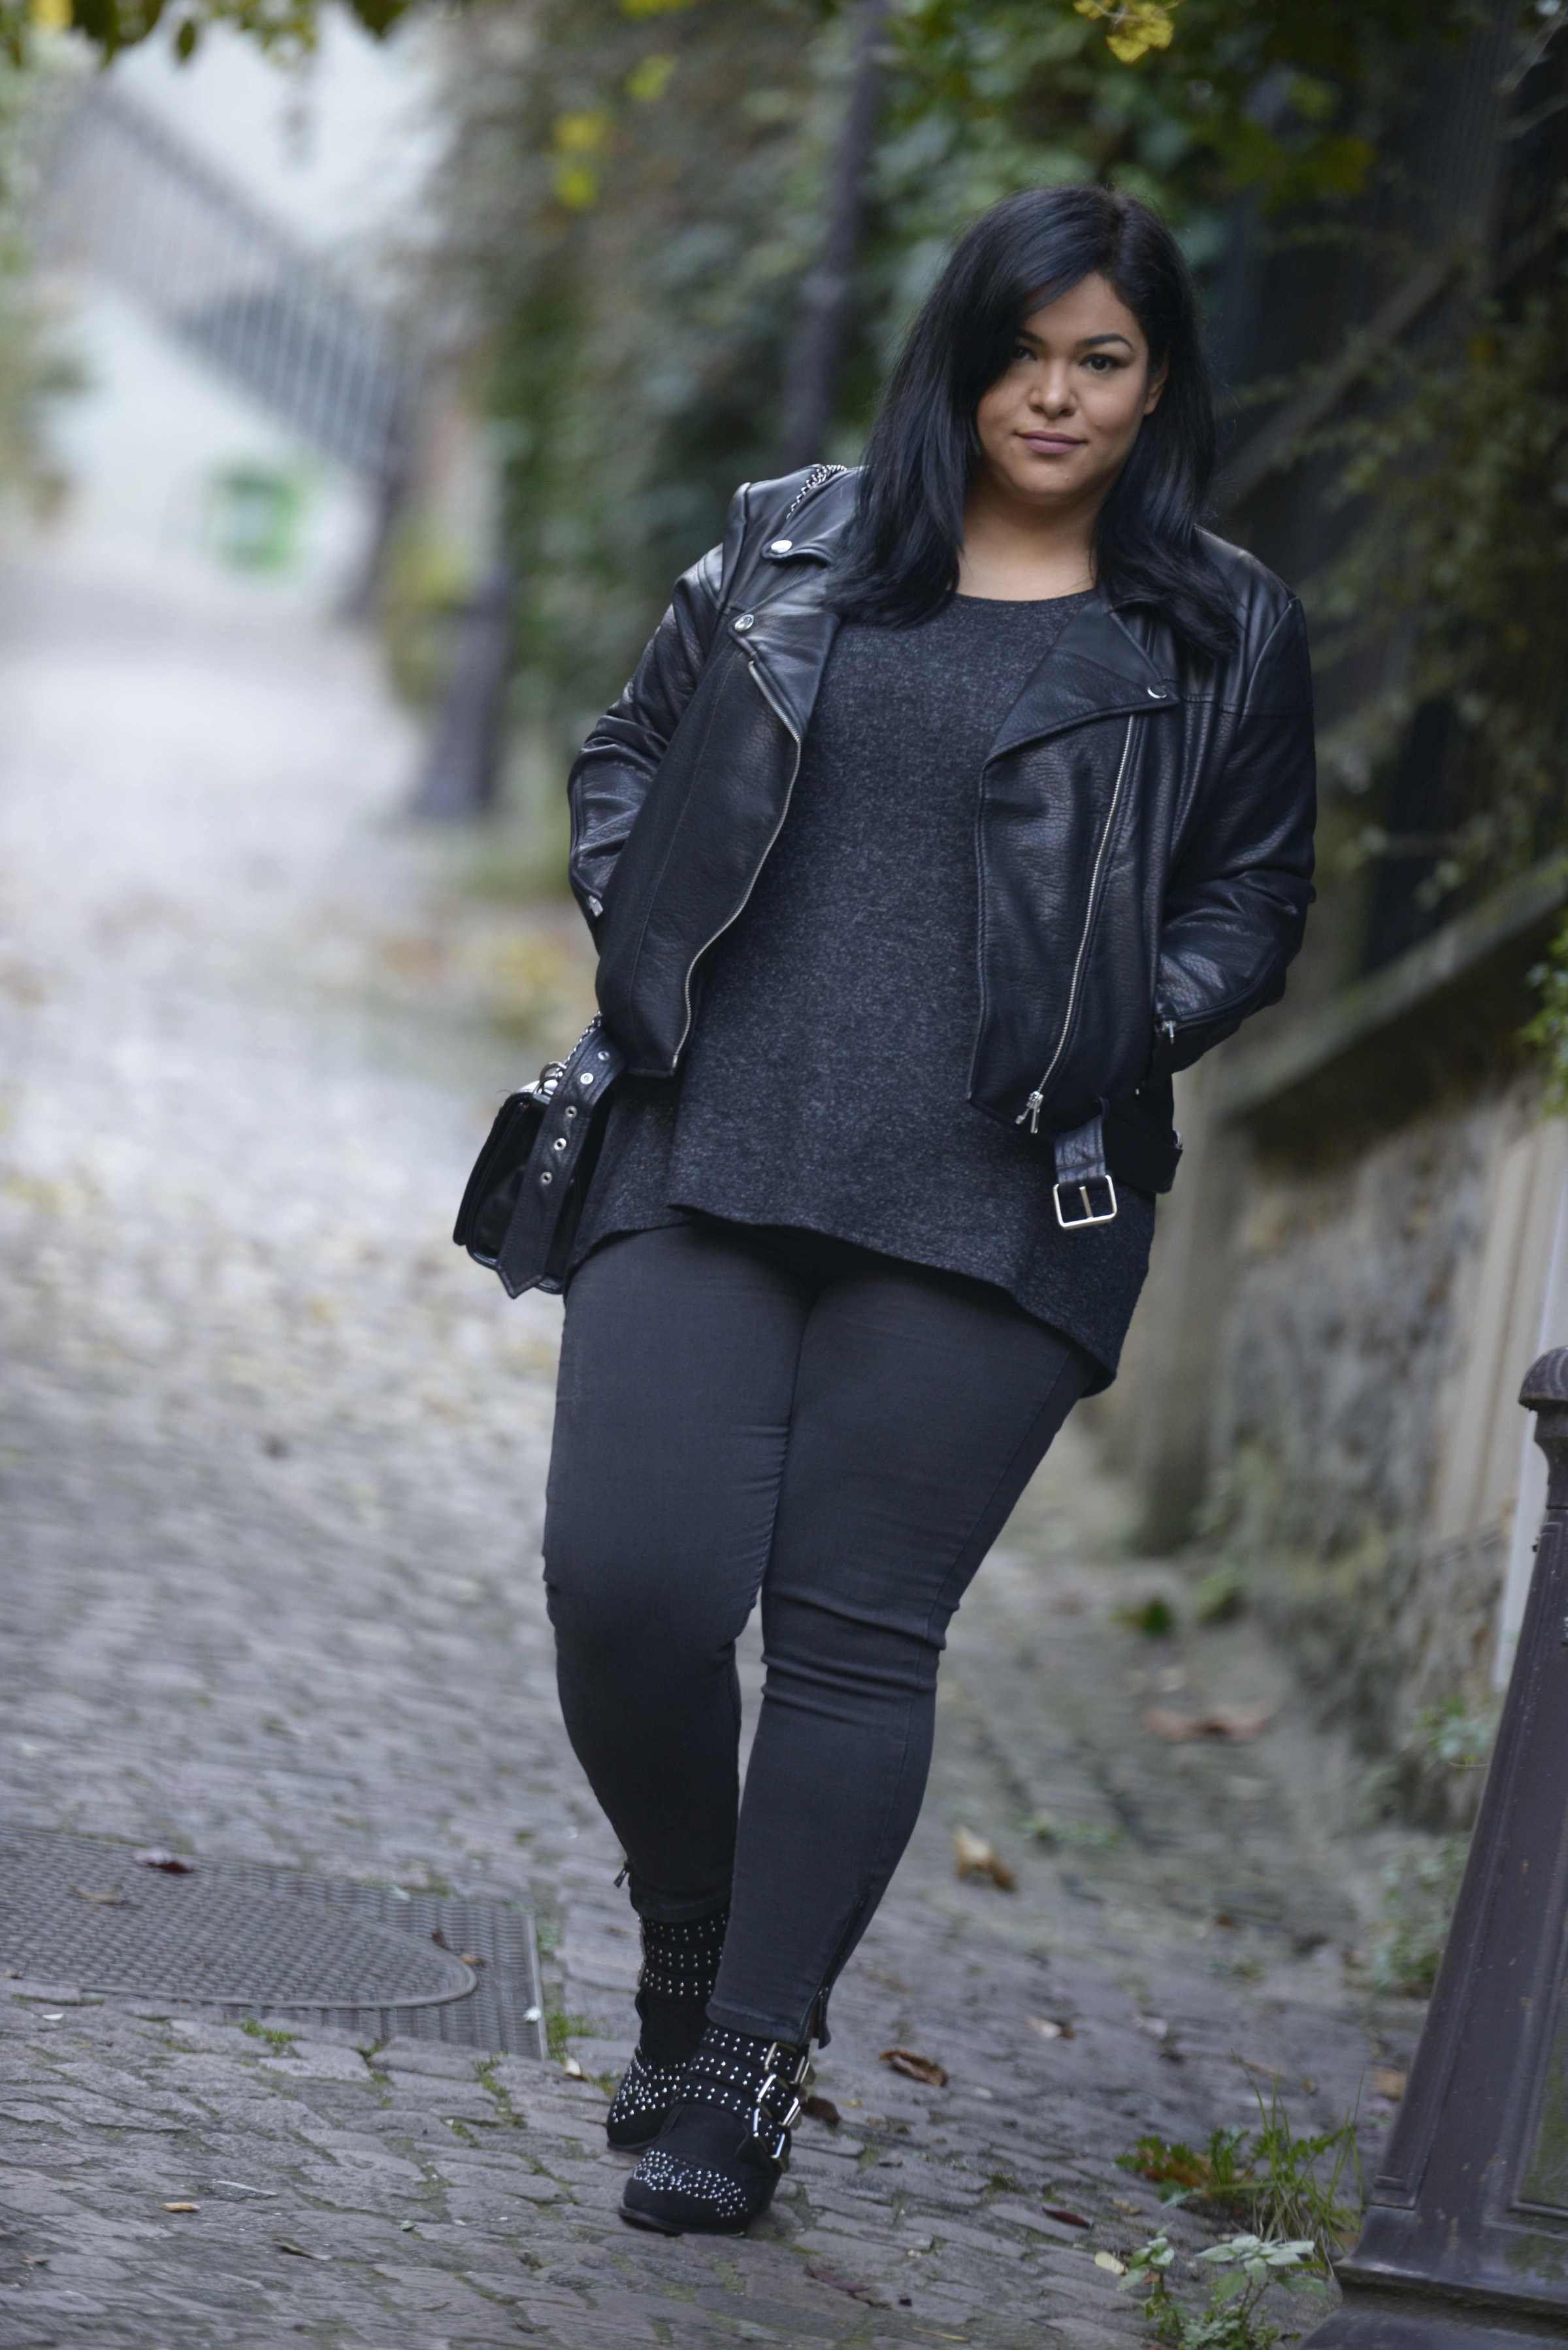 1aa2e7572f4 Plus Size Fashion for Women - Plus Size Outfit Ideas - Curvy Mood ...